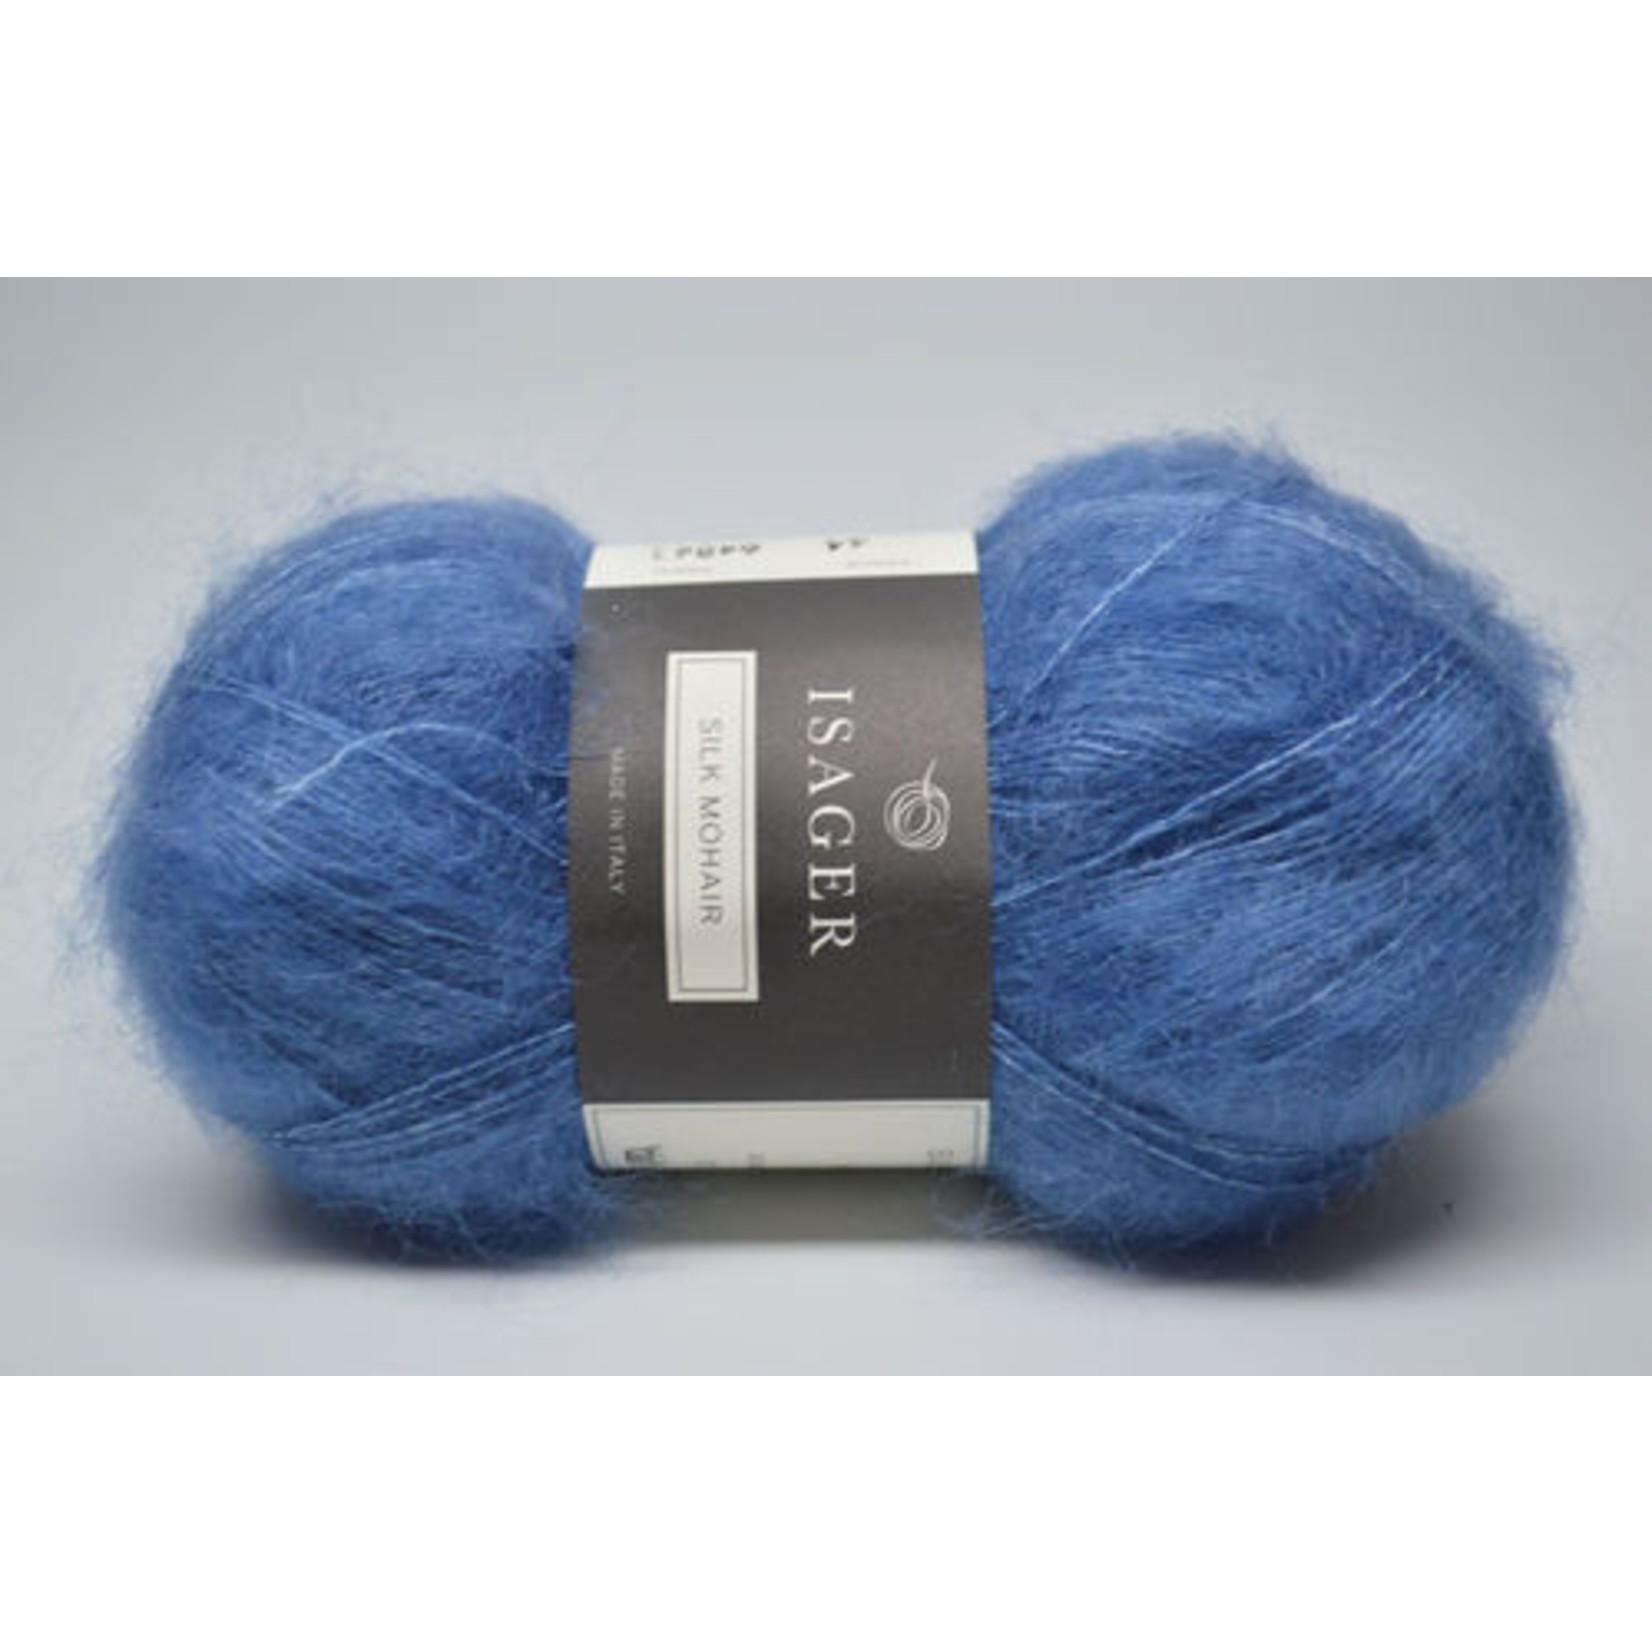 Tutto Isager Isager Silk Mohair, 44, Cobalt Blue